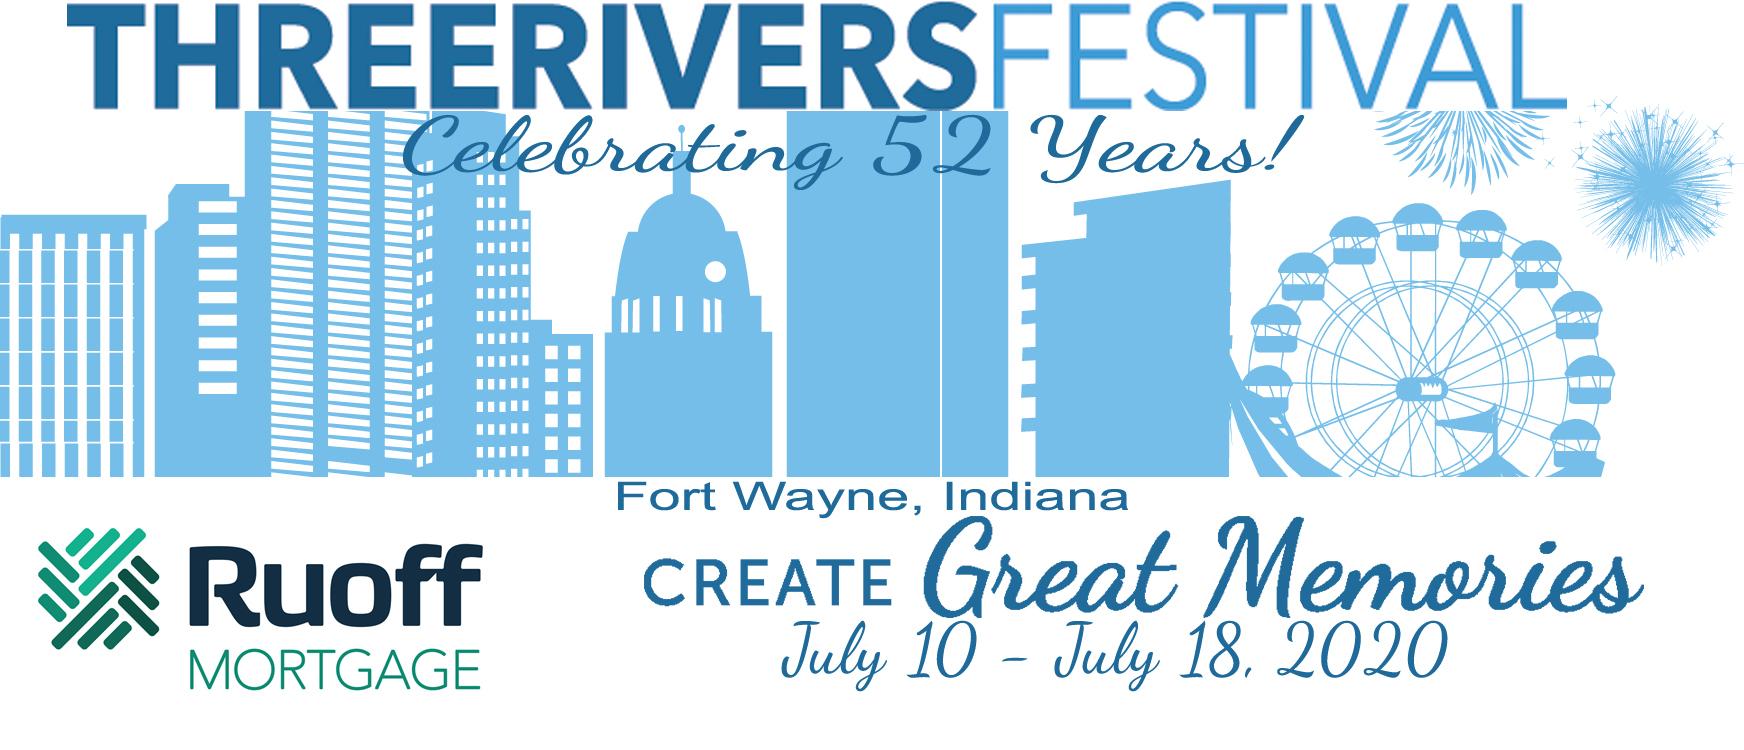 Three Rivers Festival For Fort Wayne Events Calendar 2021